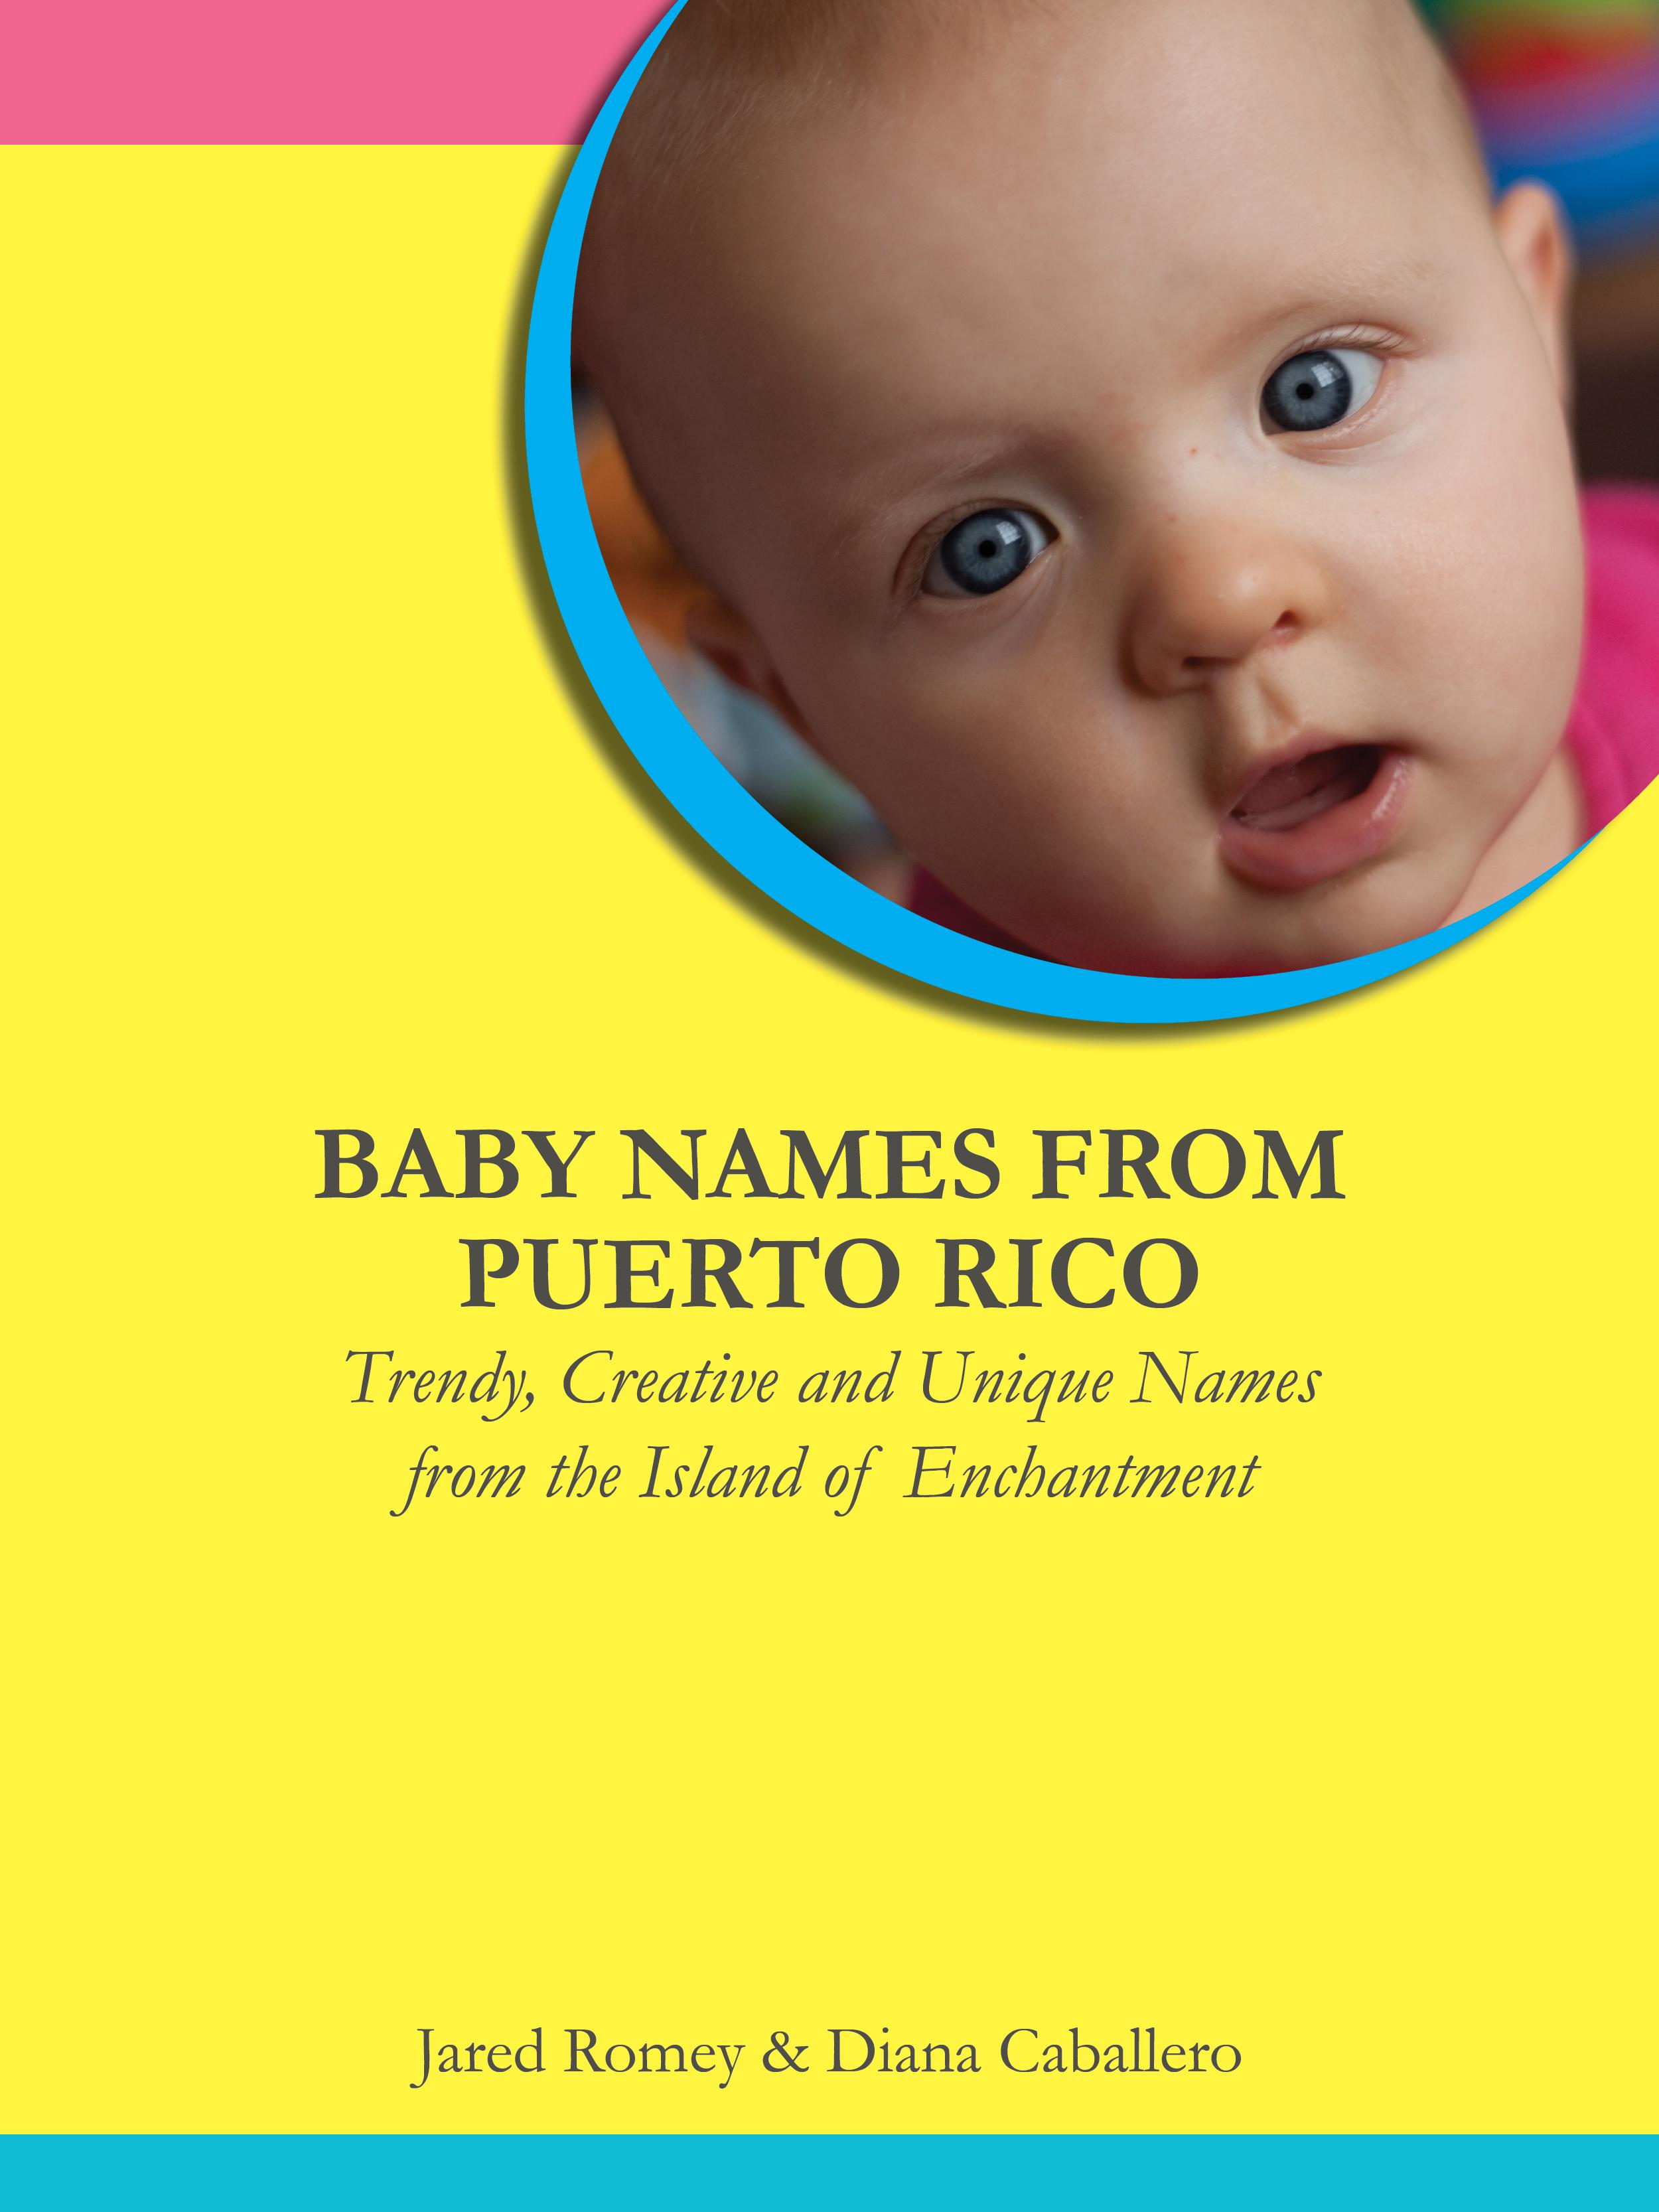 Italian Boy Name: Baby Names From Puerto Rico: Trendy, Creative